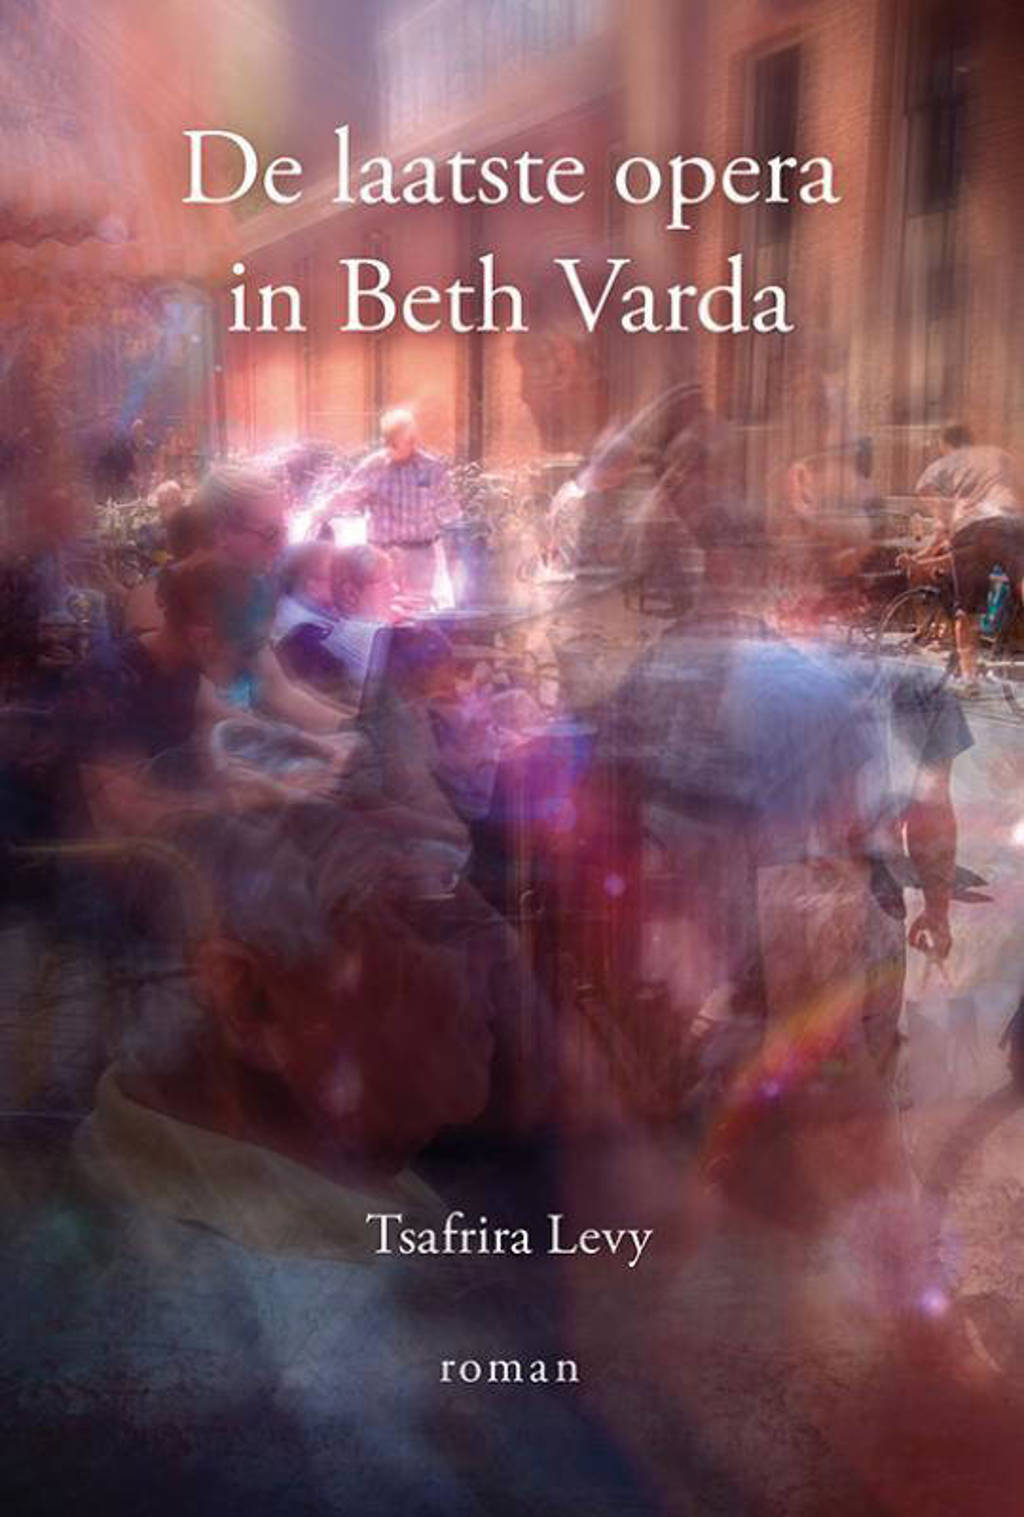 De laatste opera in Beth Varda - Tsafrira Levy